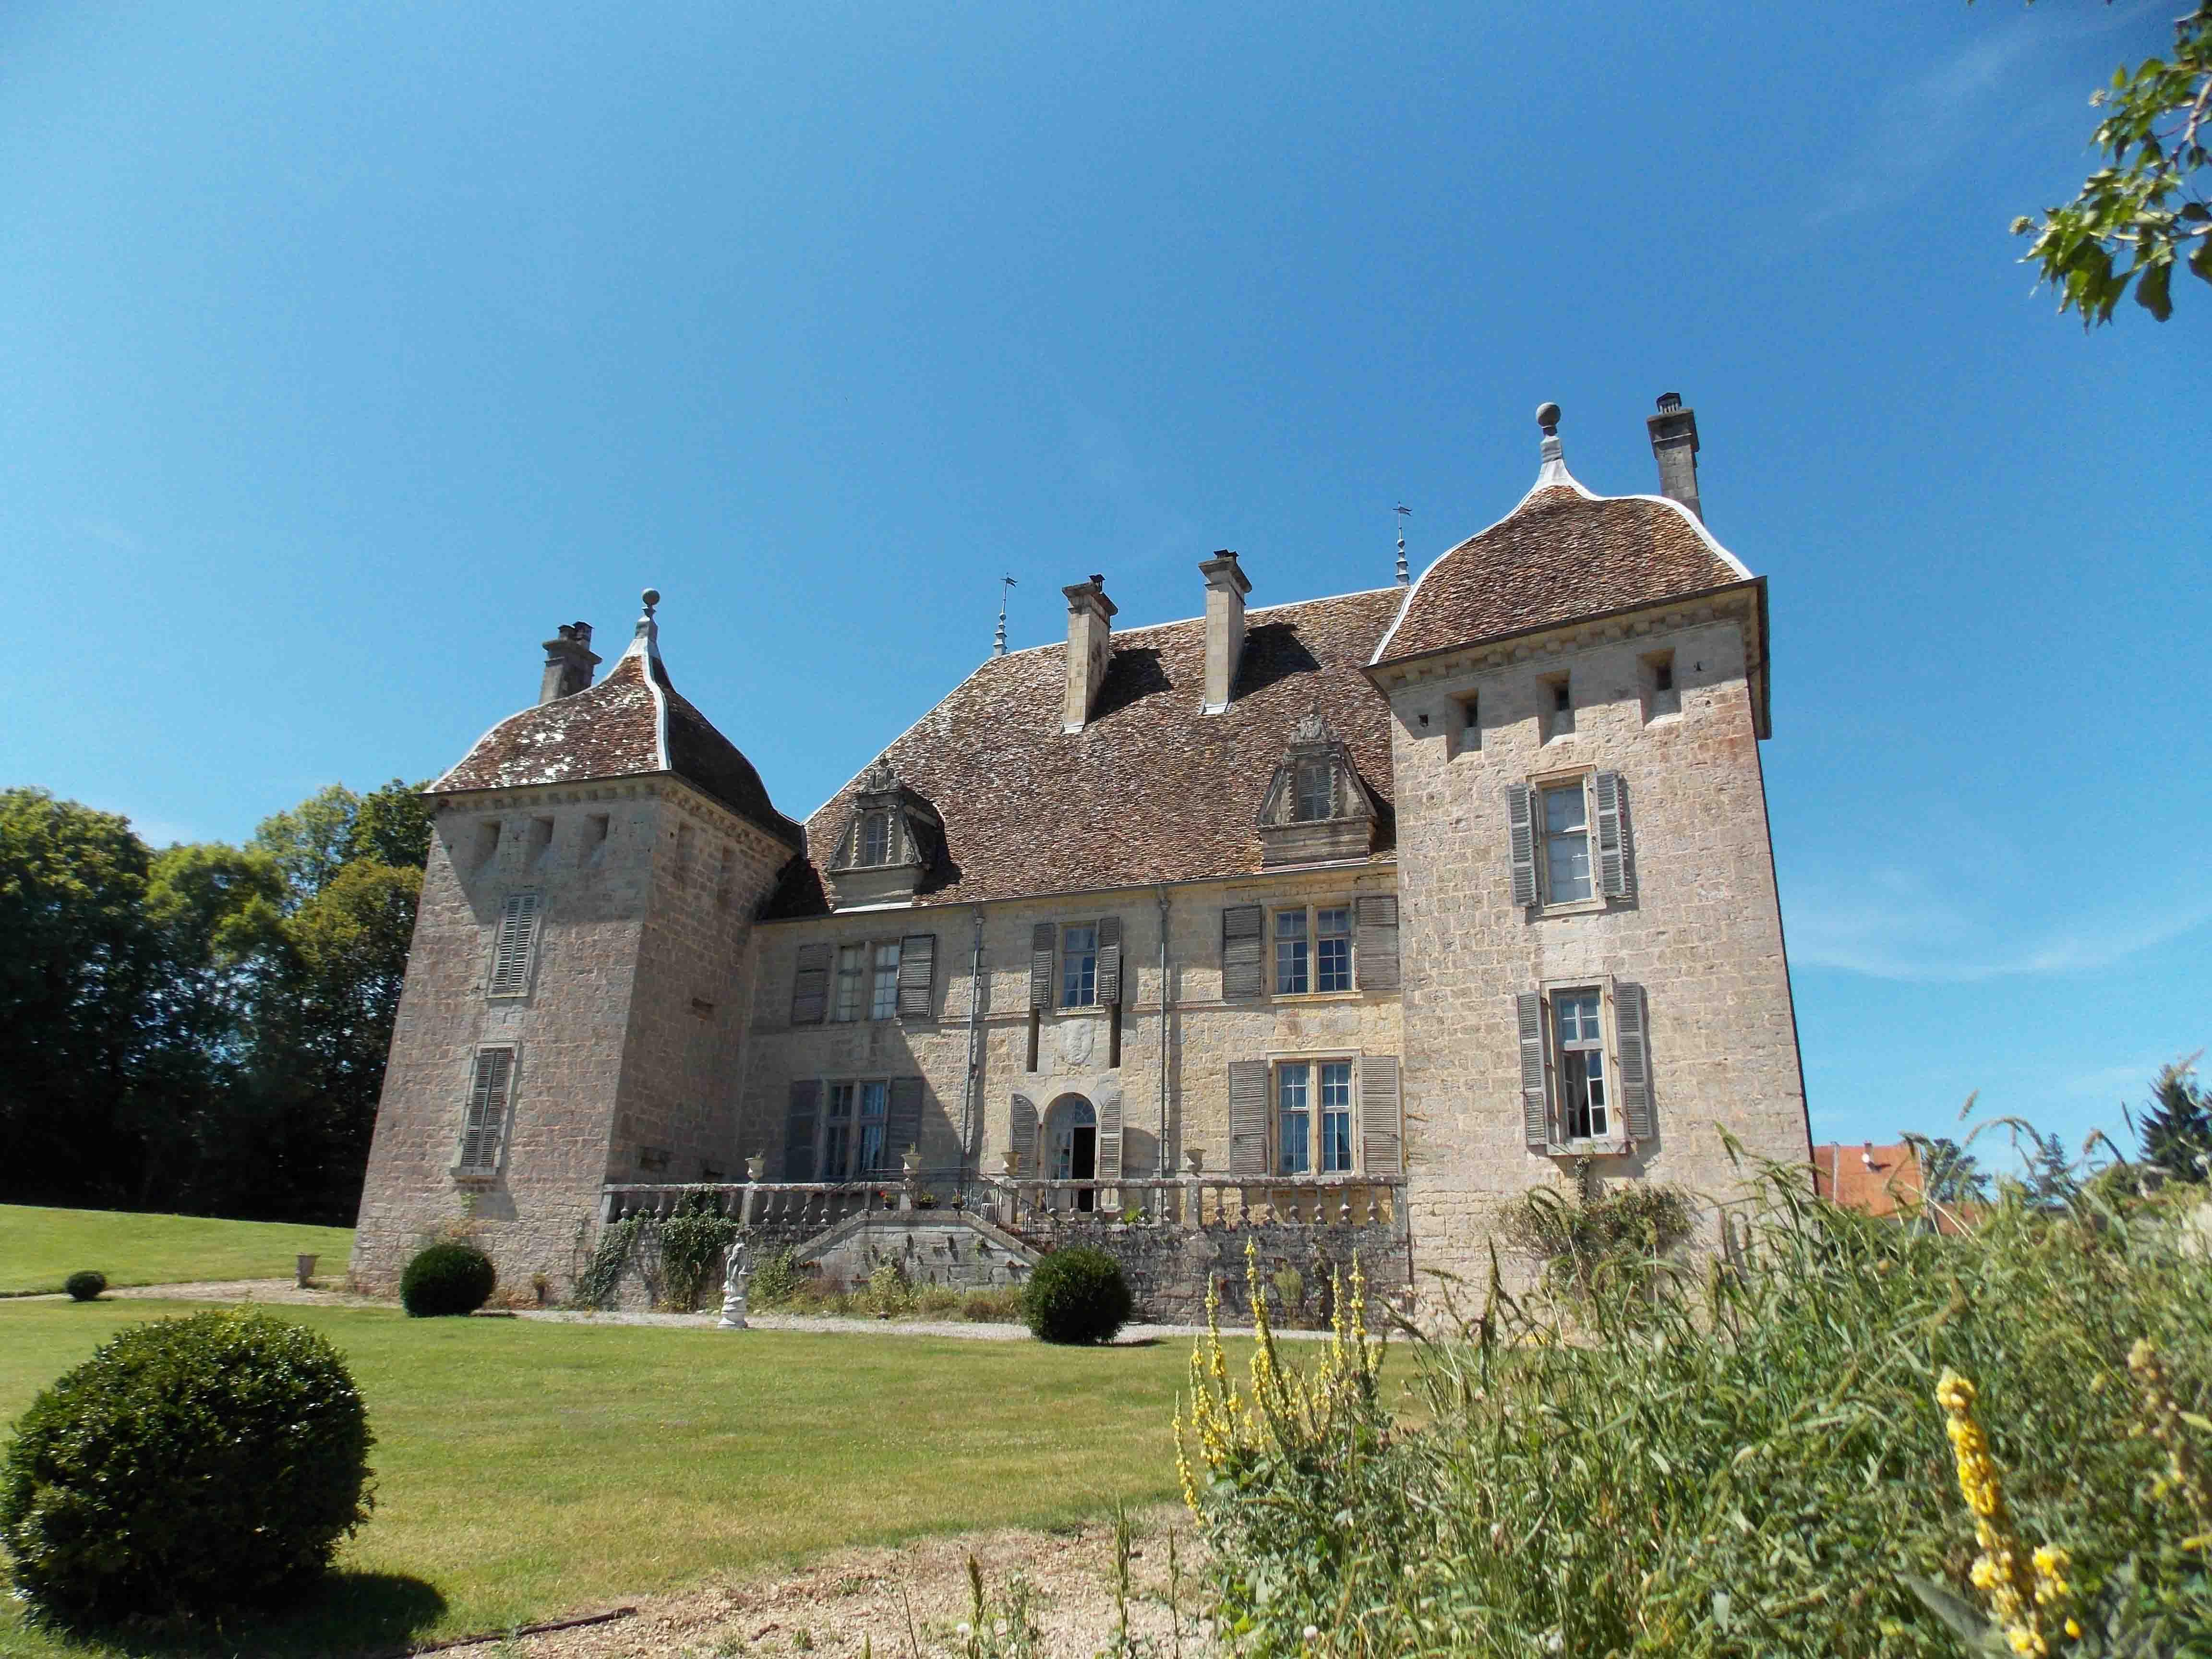 Chateau de filain